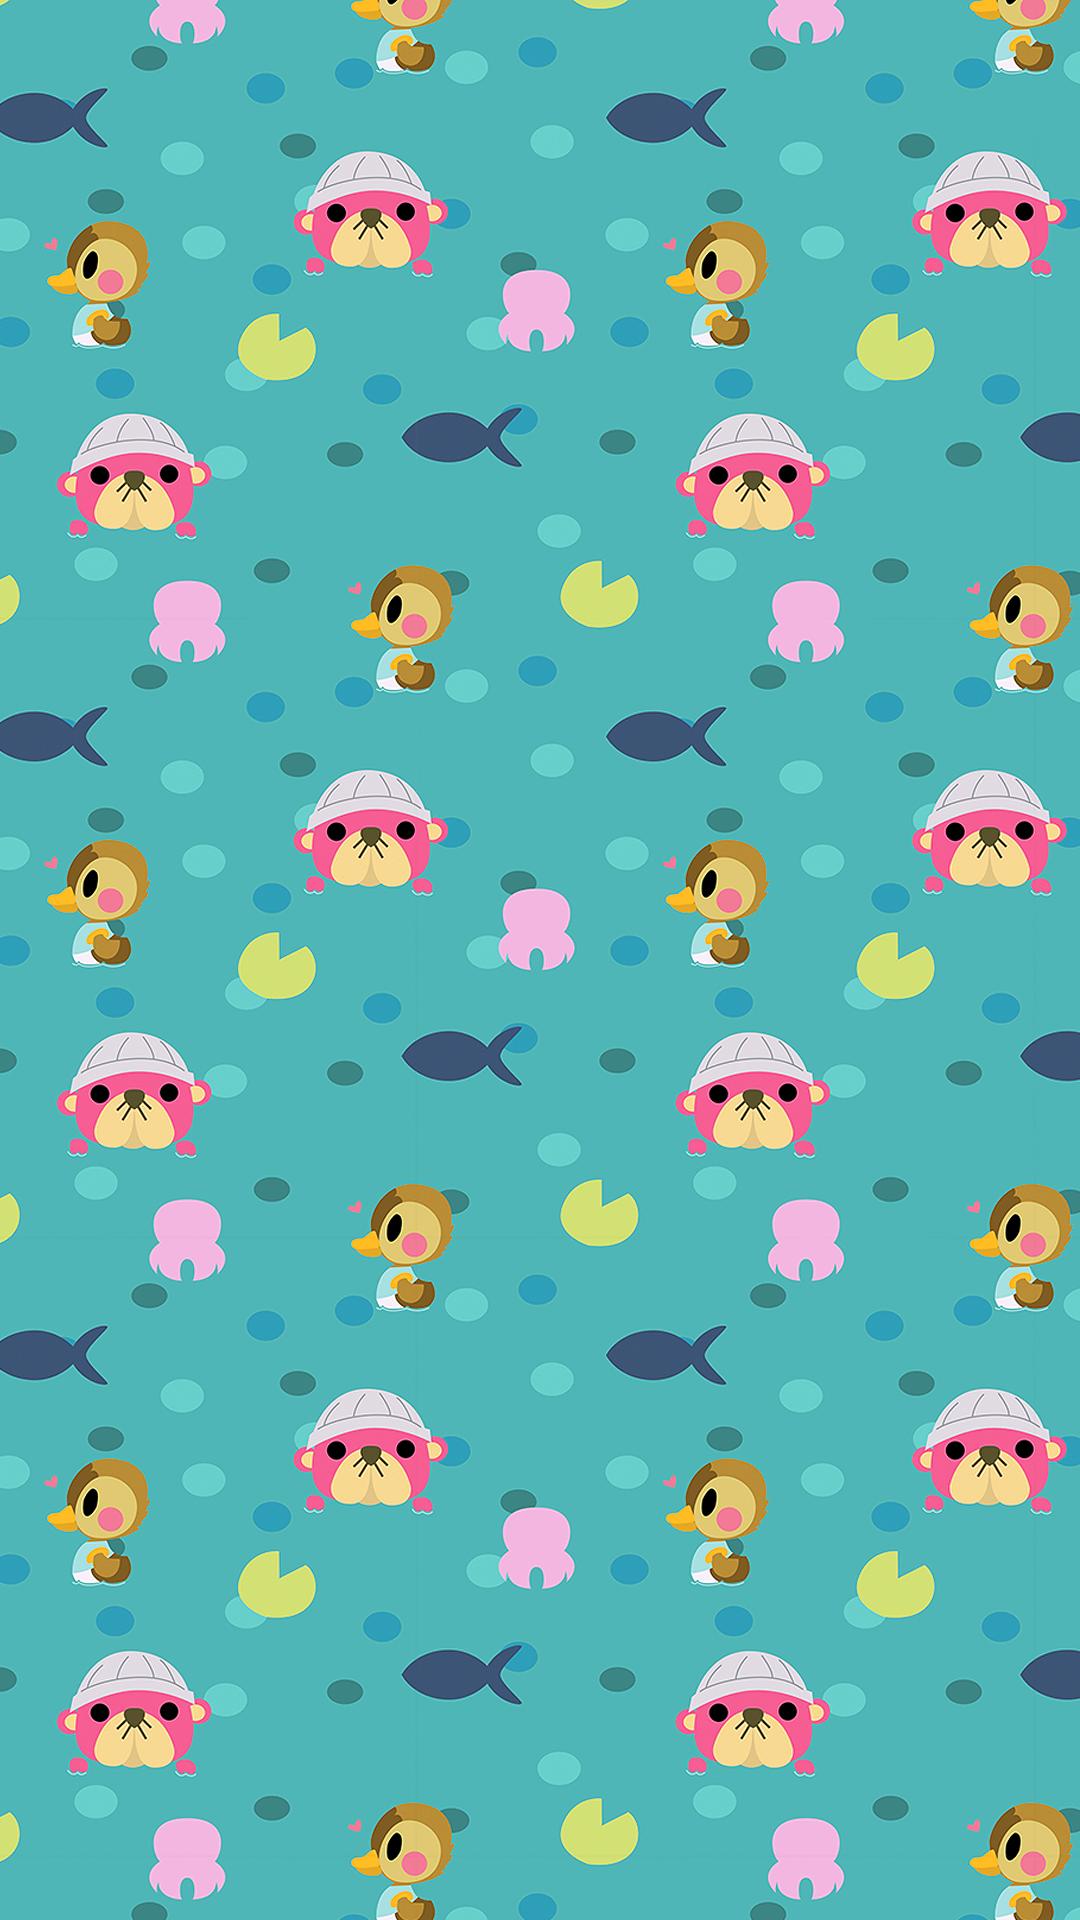 Animal crossing cute wallpaper 1080 x 1920 HD (anime